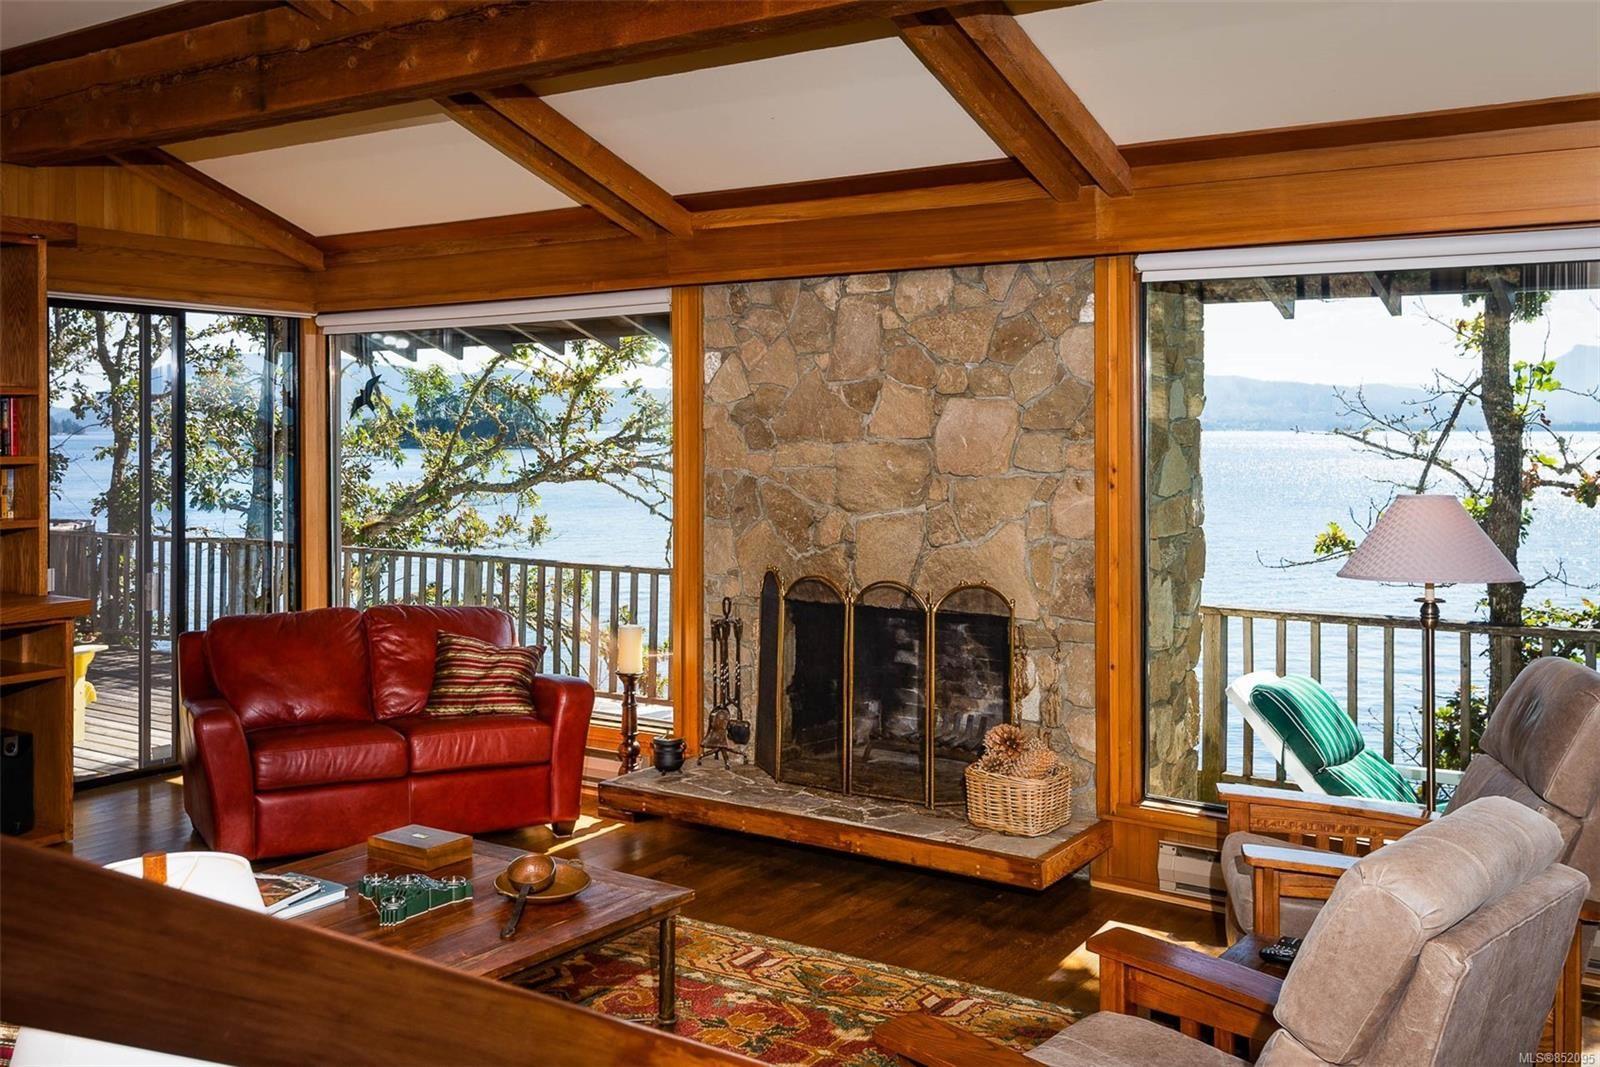 Photo 4: Photos: 236 McGill Rd in : GI Salt Spring House for sale (Gulf Islands)  : MLS®# 852095